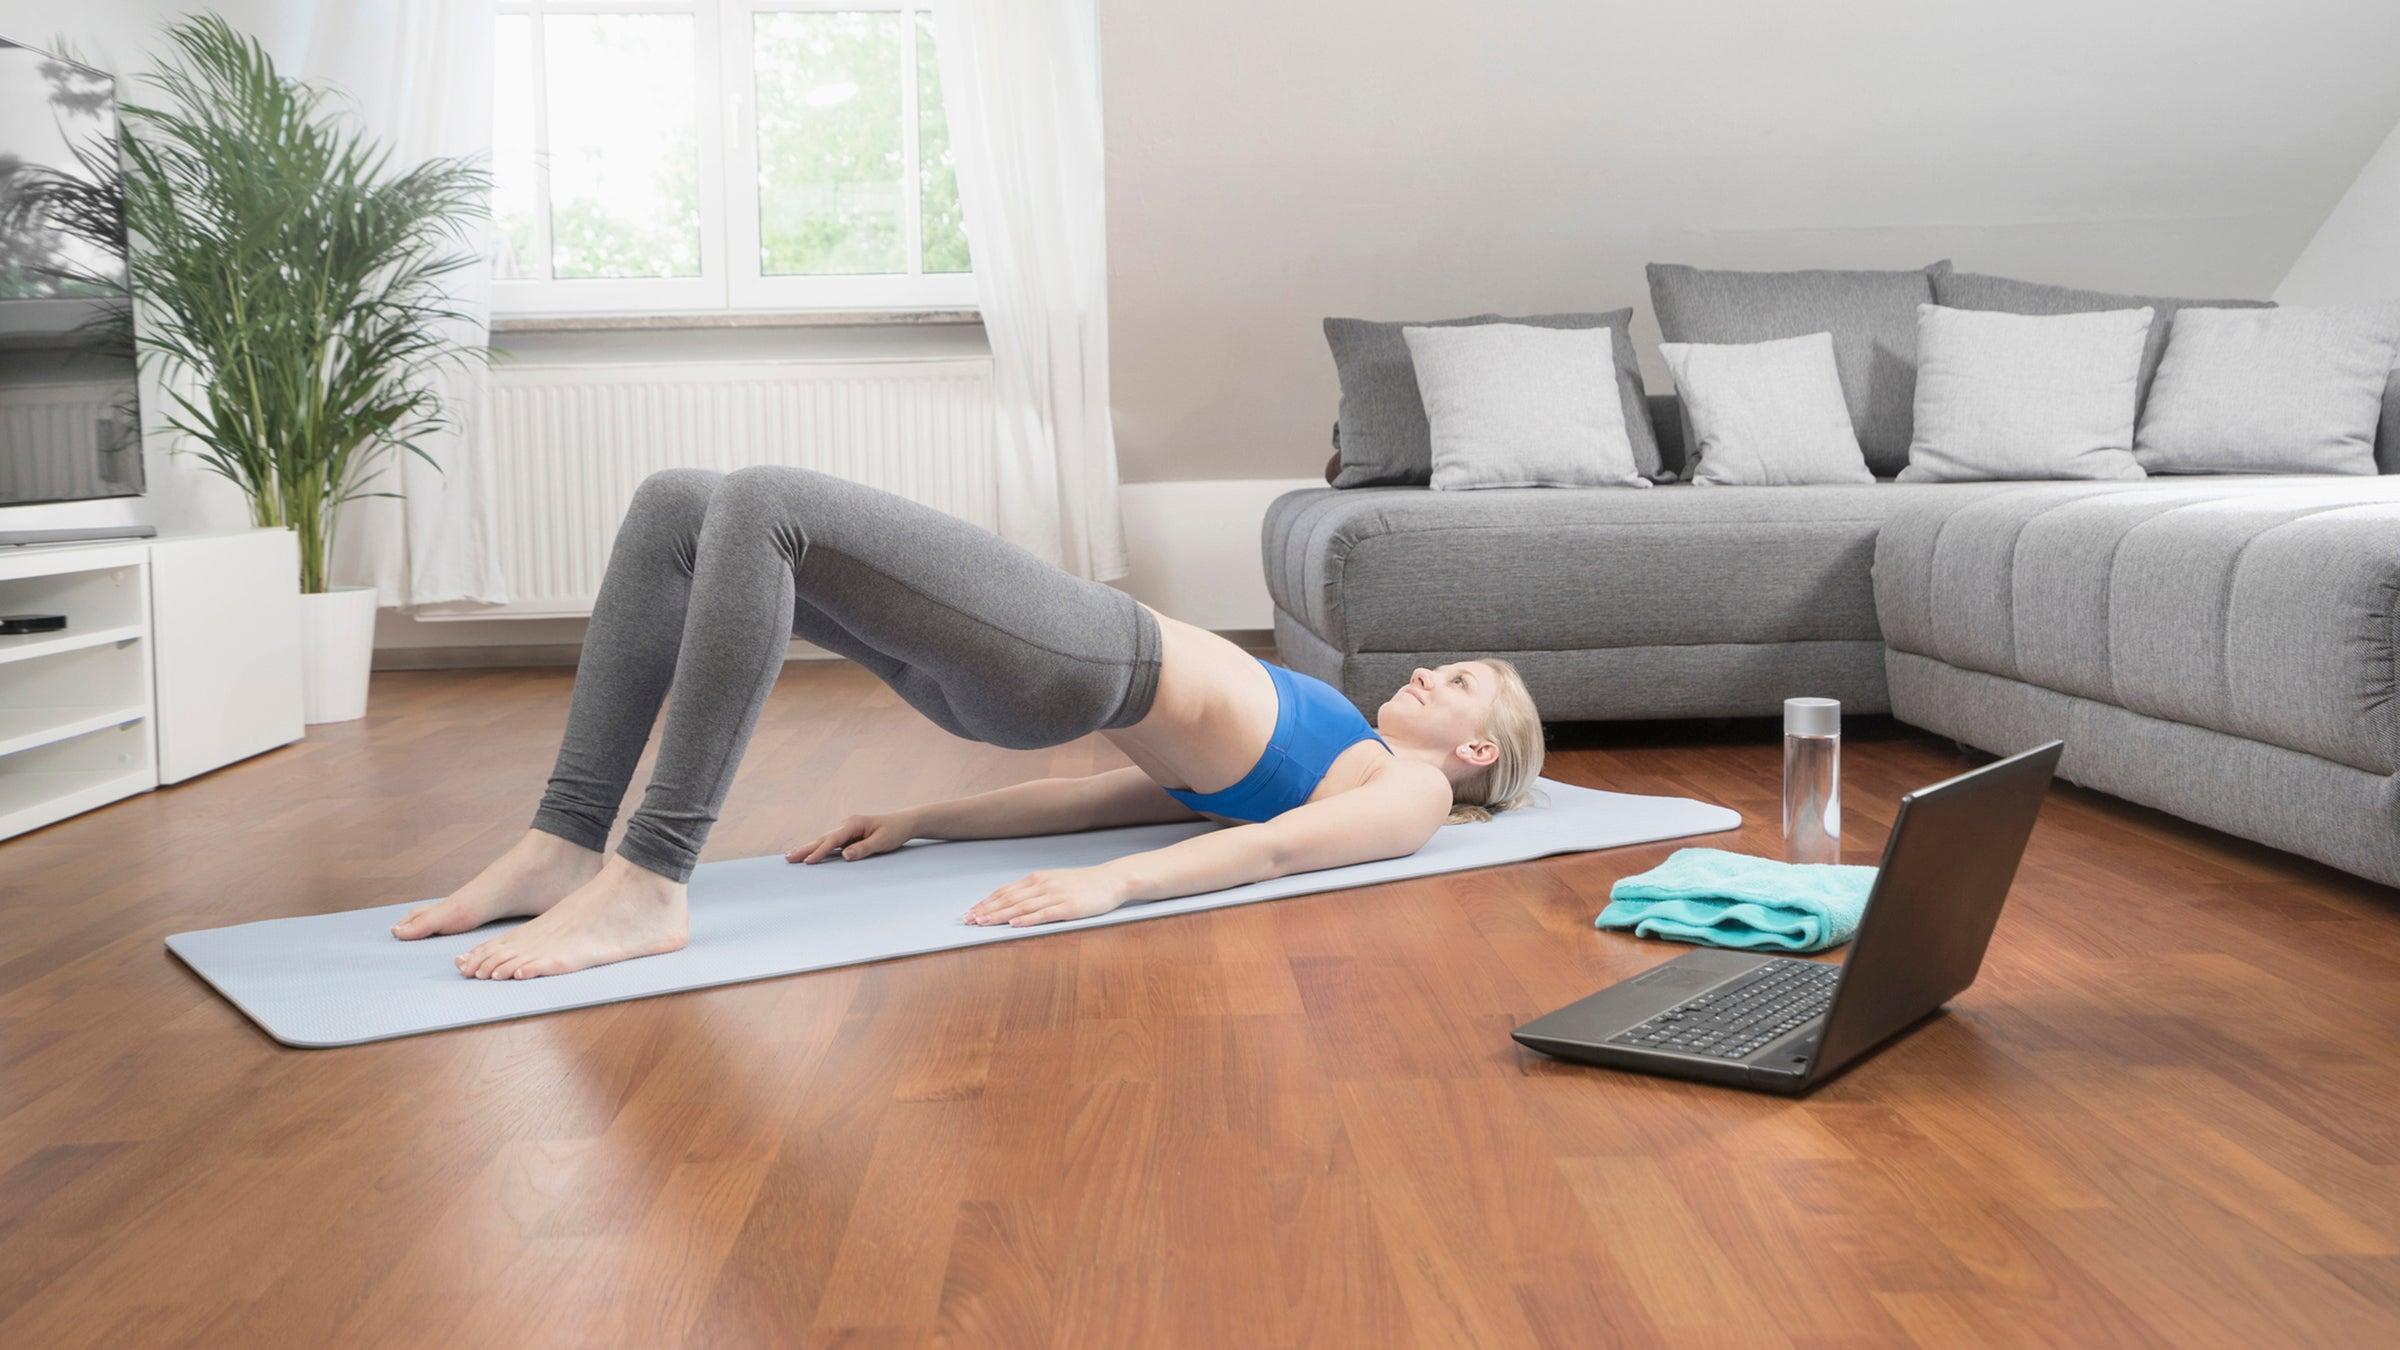 exercises via tele-PT